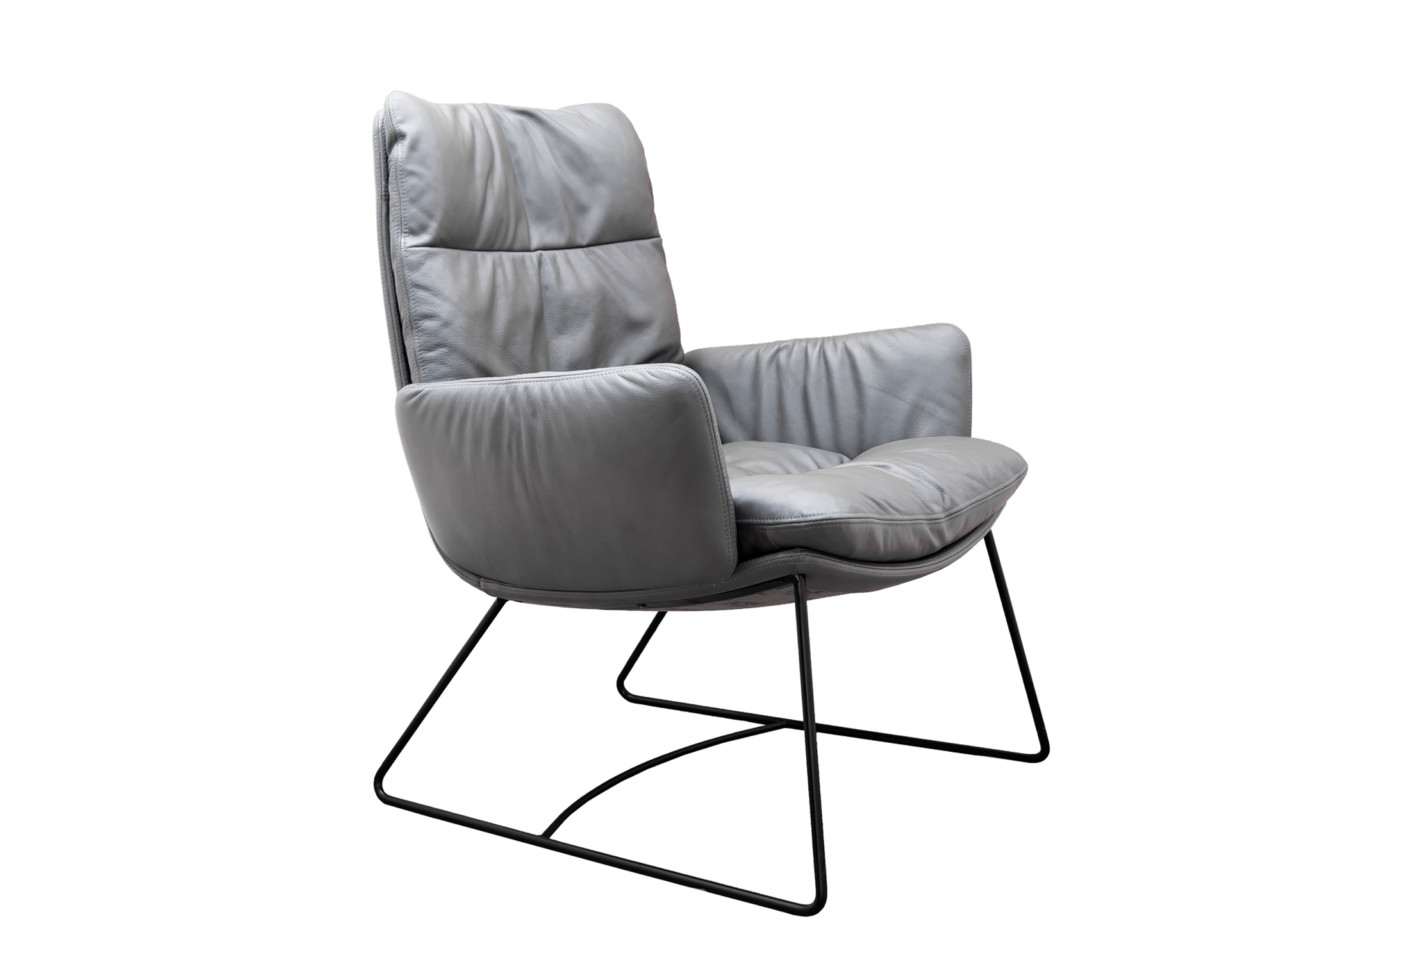 arva lounge sessel mit kufen von kff stylepark. Black Bedroom Furniture Sets. Home Design Ideas